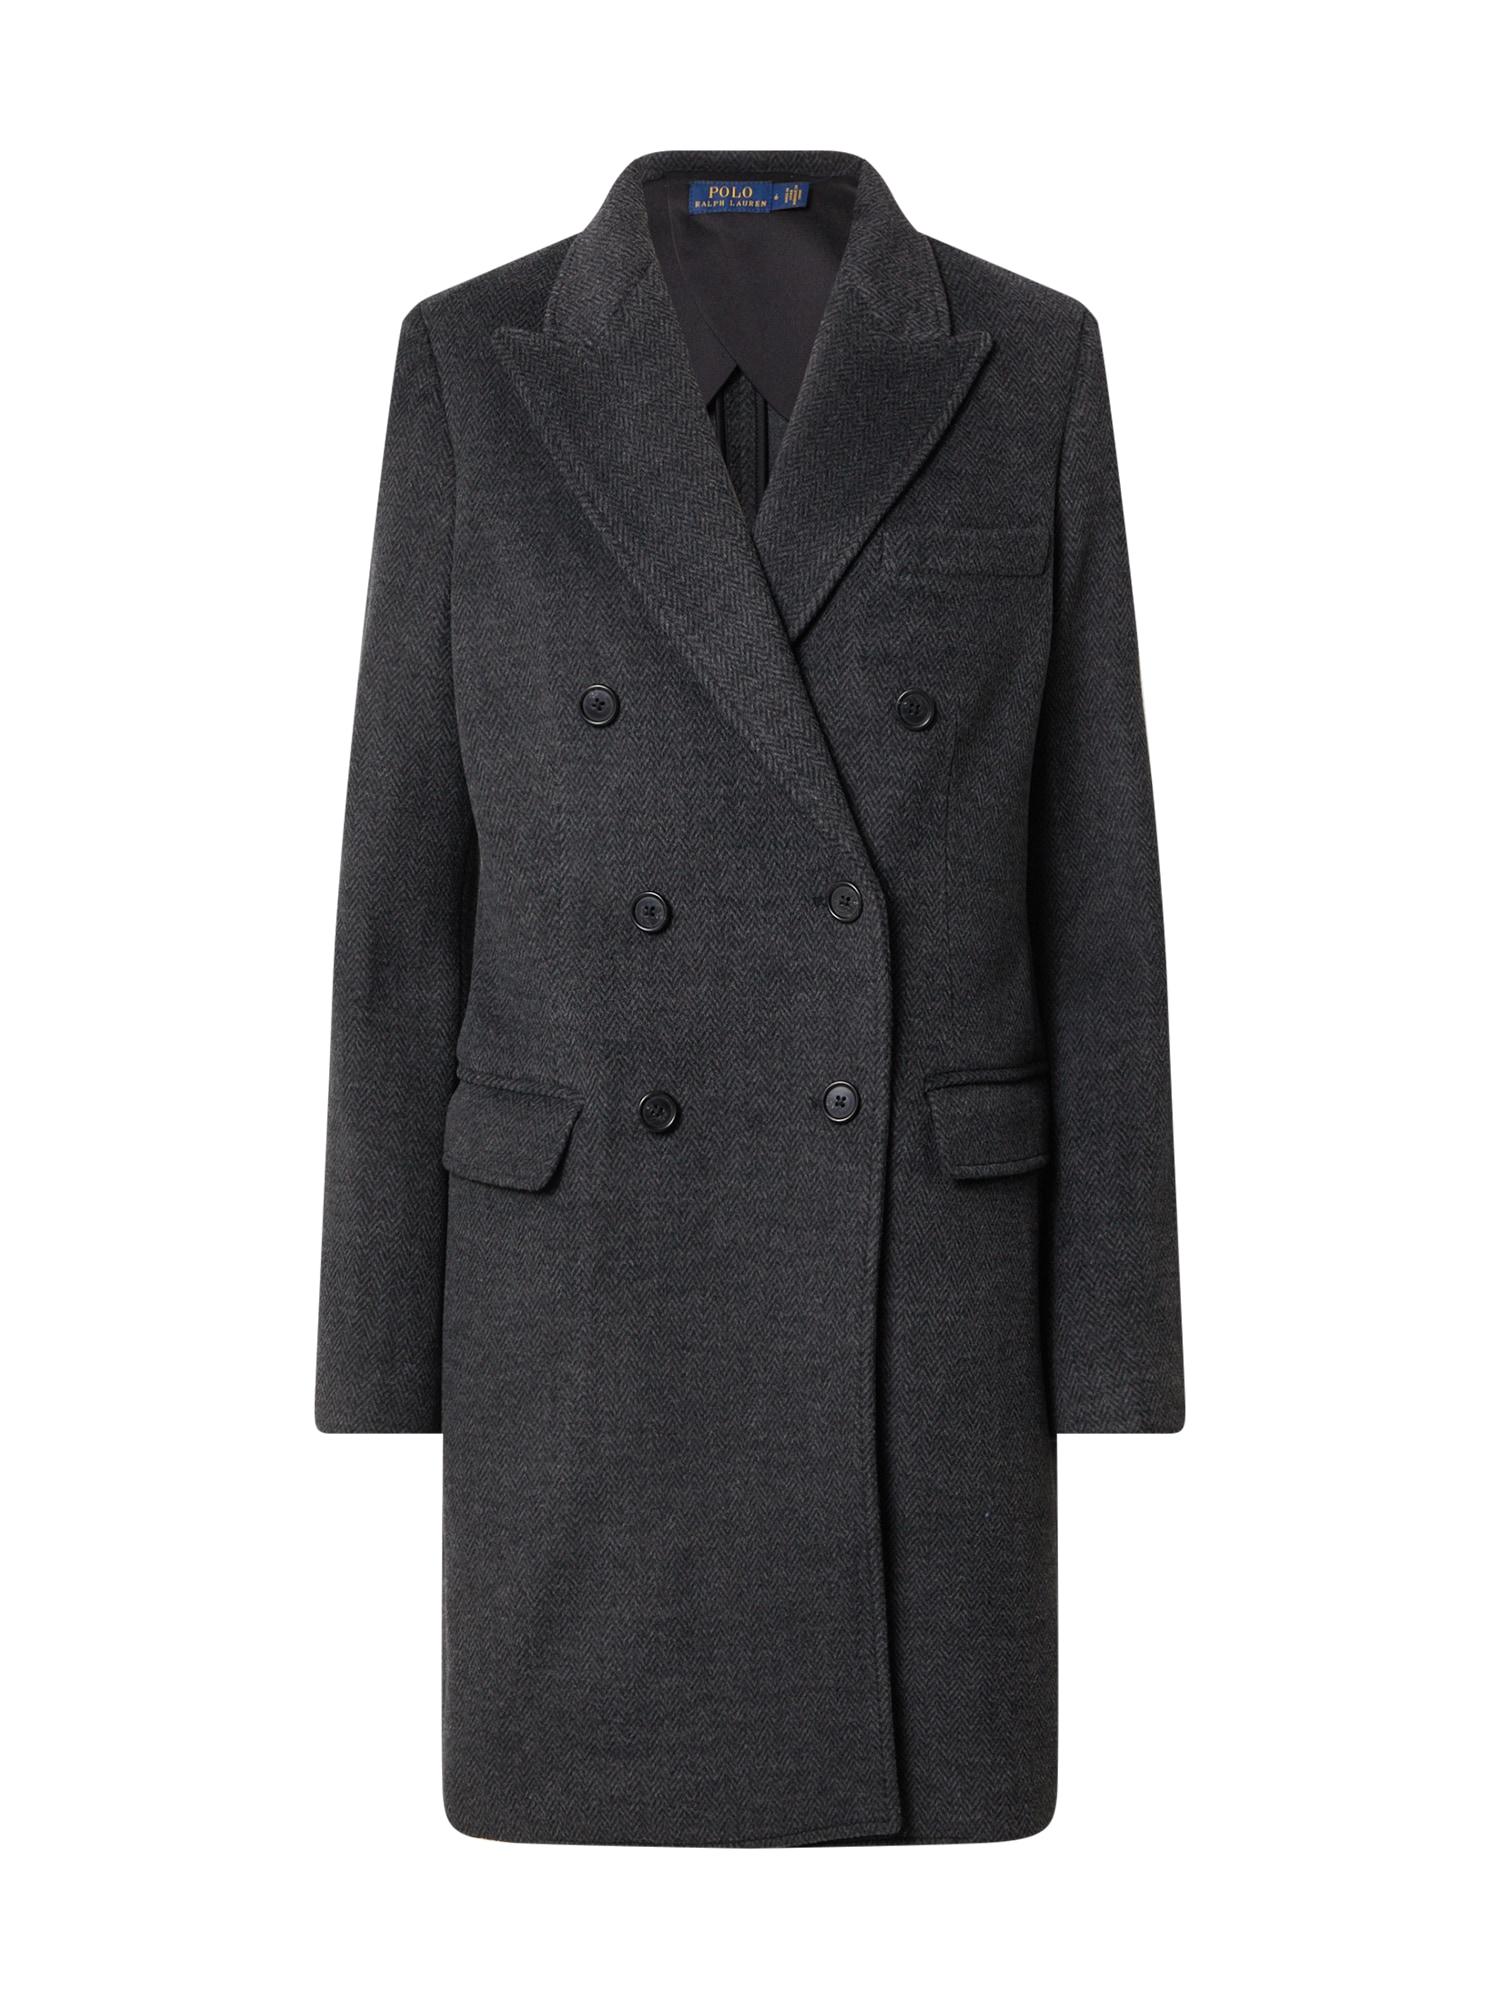 POLO RALPH LAUREN Demisezoninis paltas tamsiai pilka